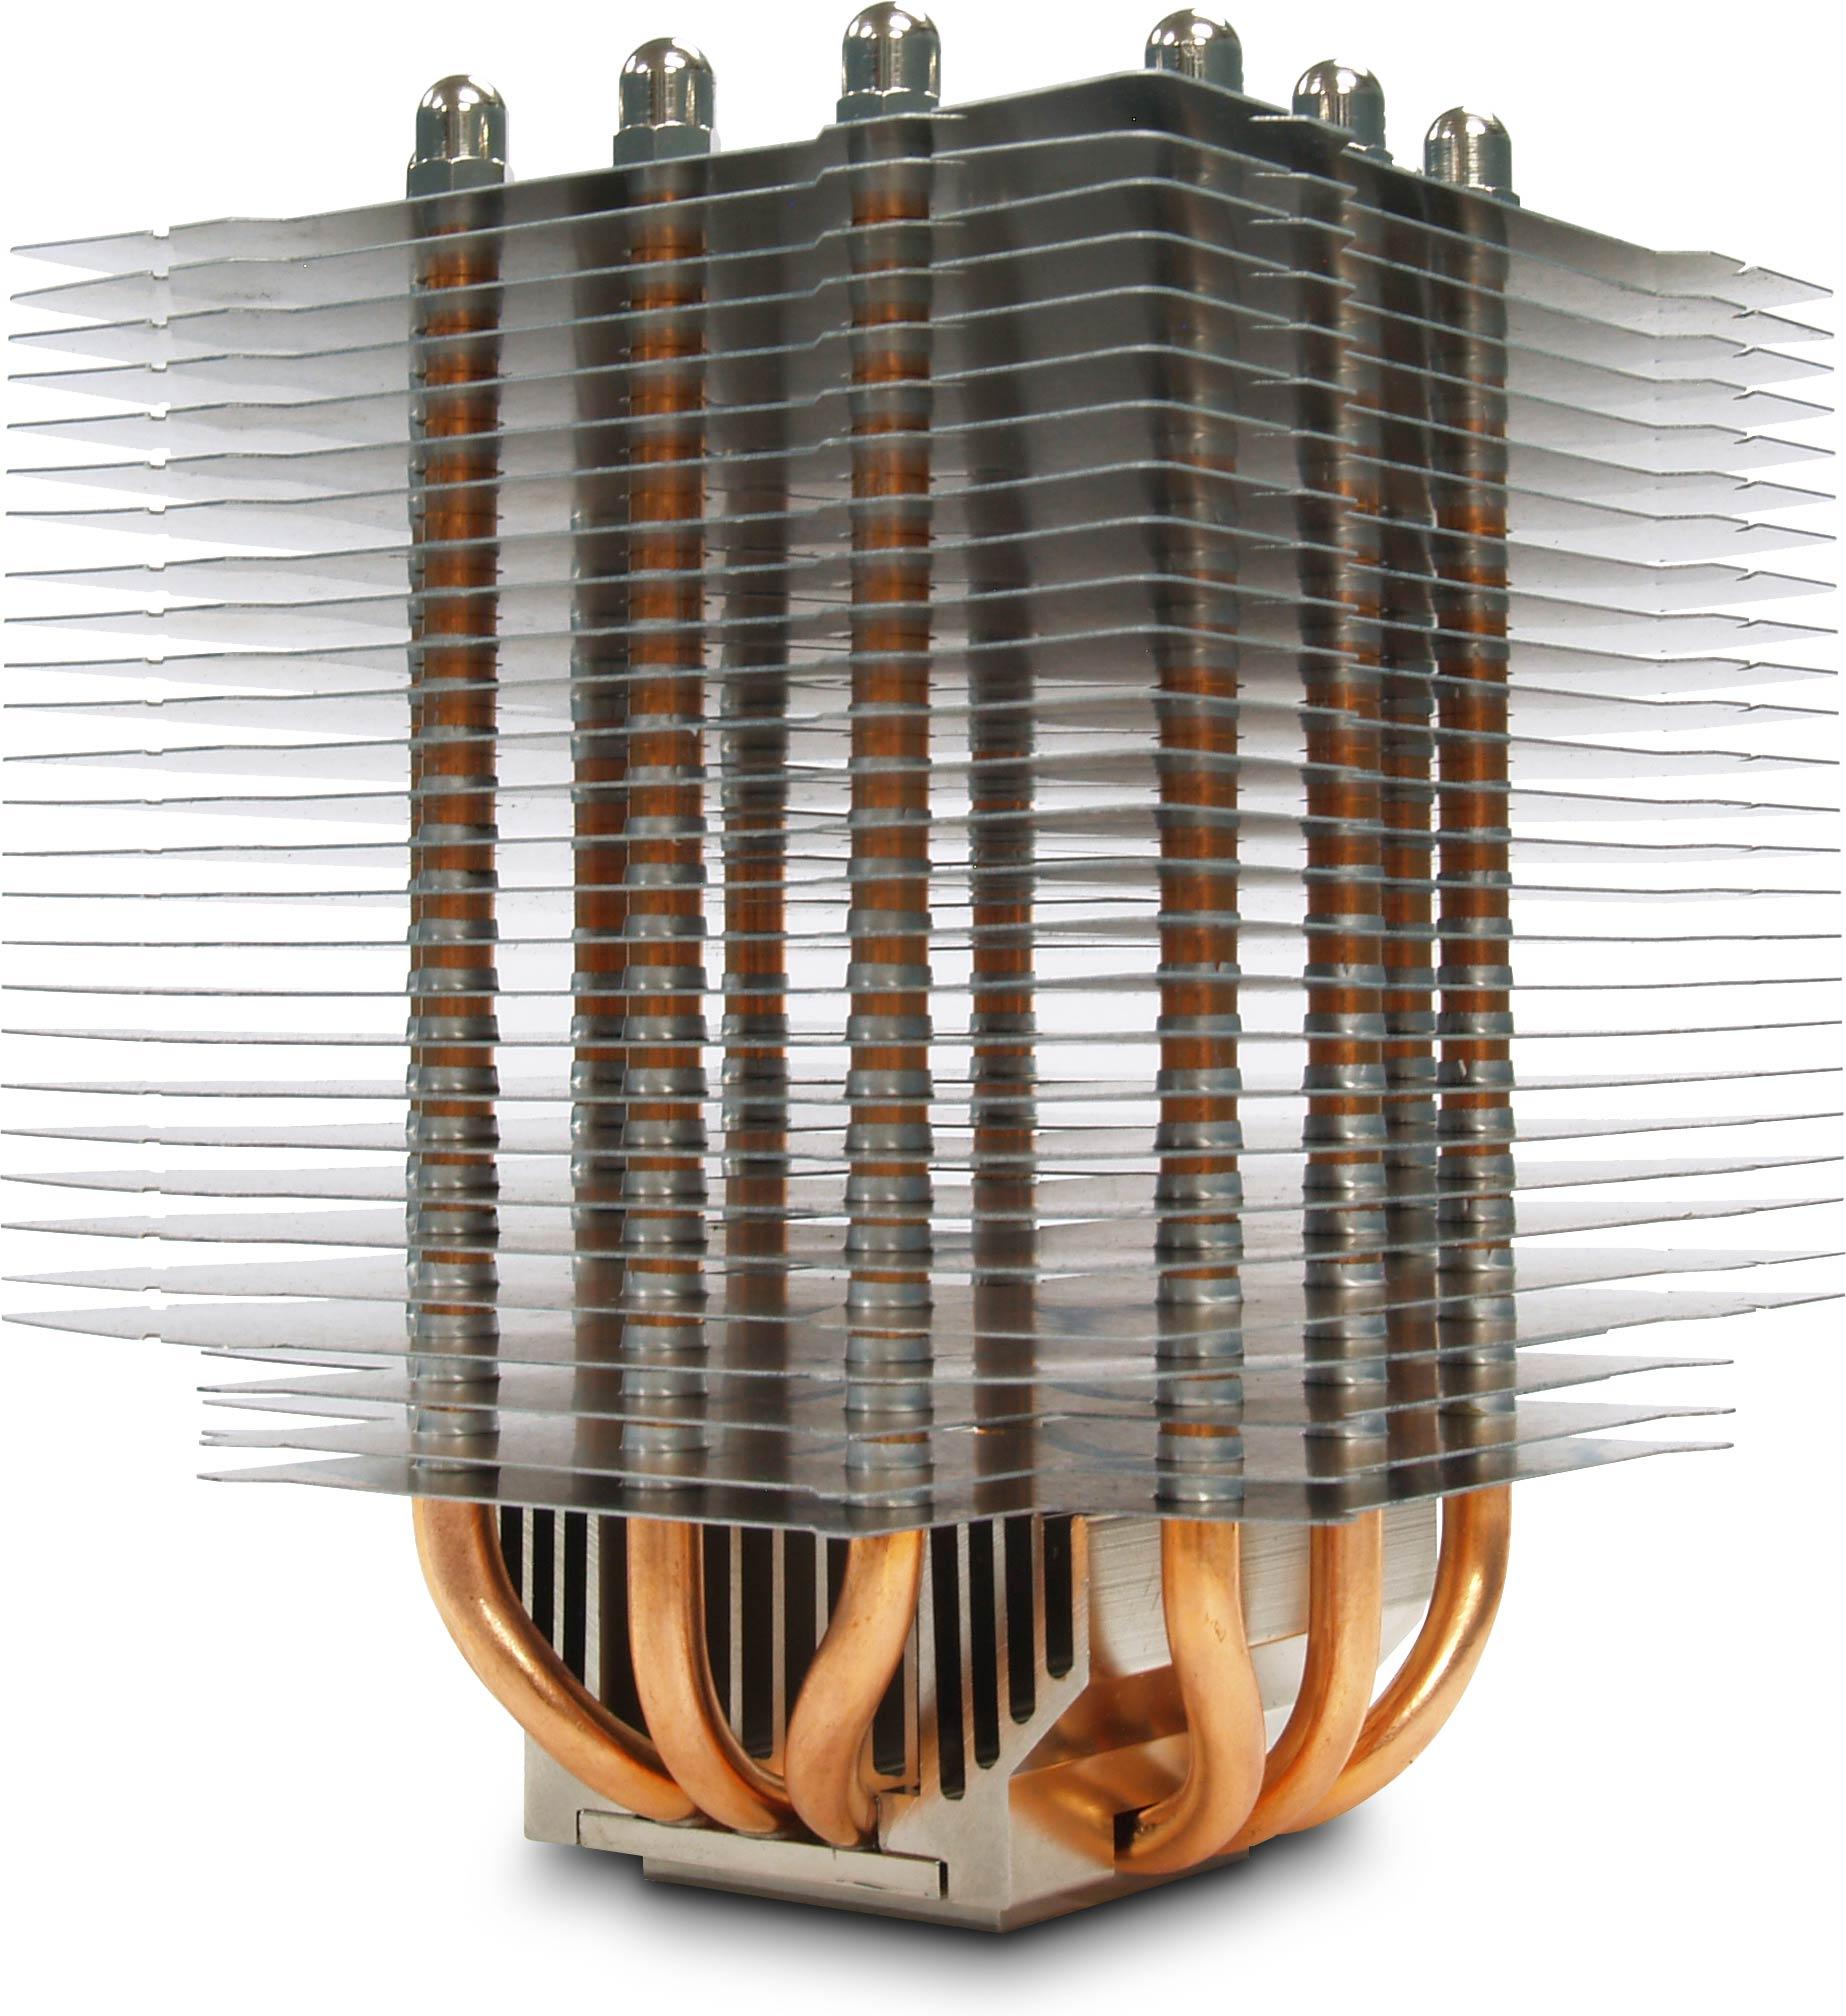 Ninja Ii Rev B Heatpipe Cpu Cooler With 120mm Fan